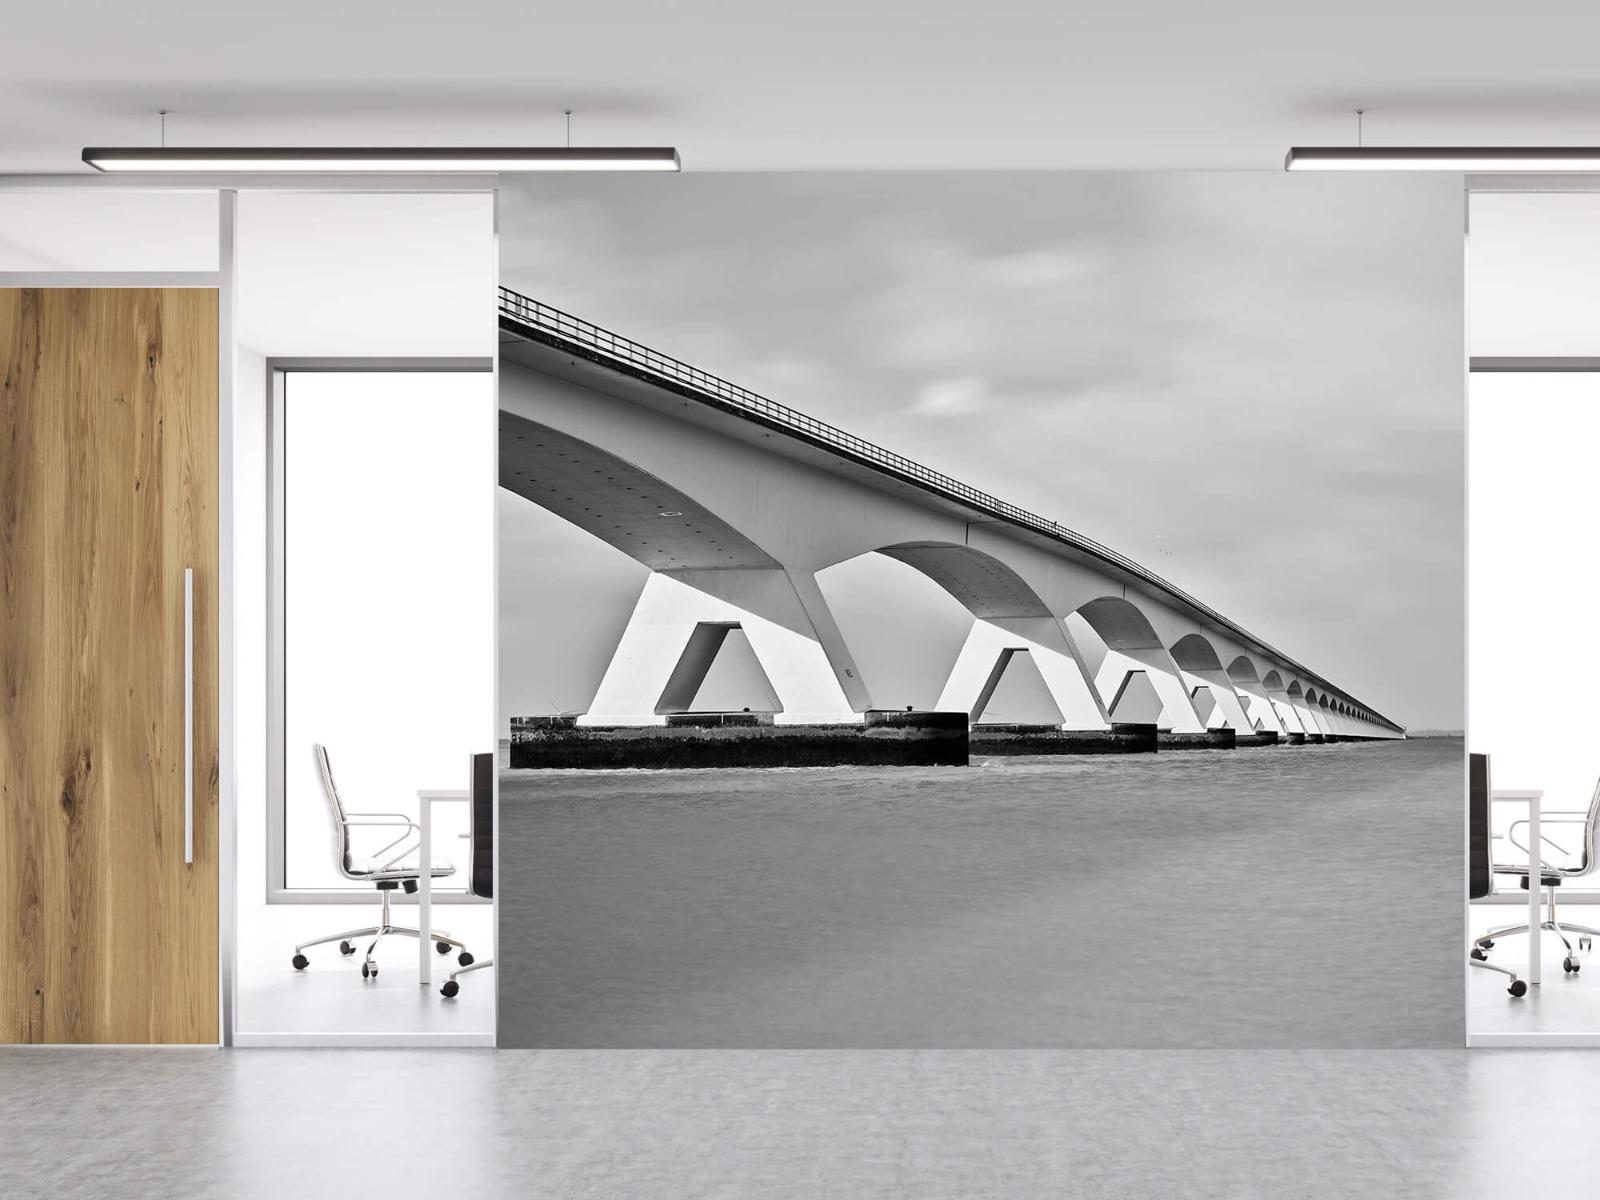 Zwart Wit behang - Lange brug - Kantoor 12